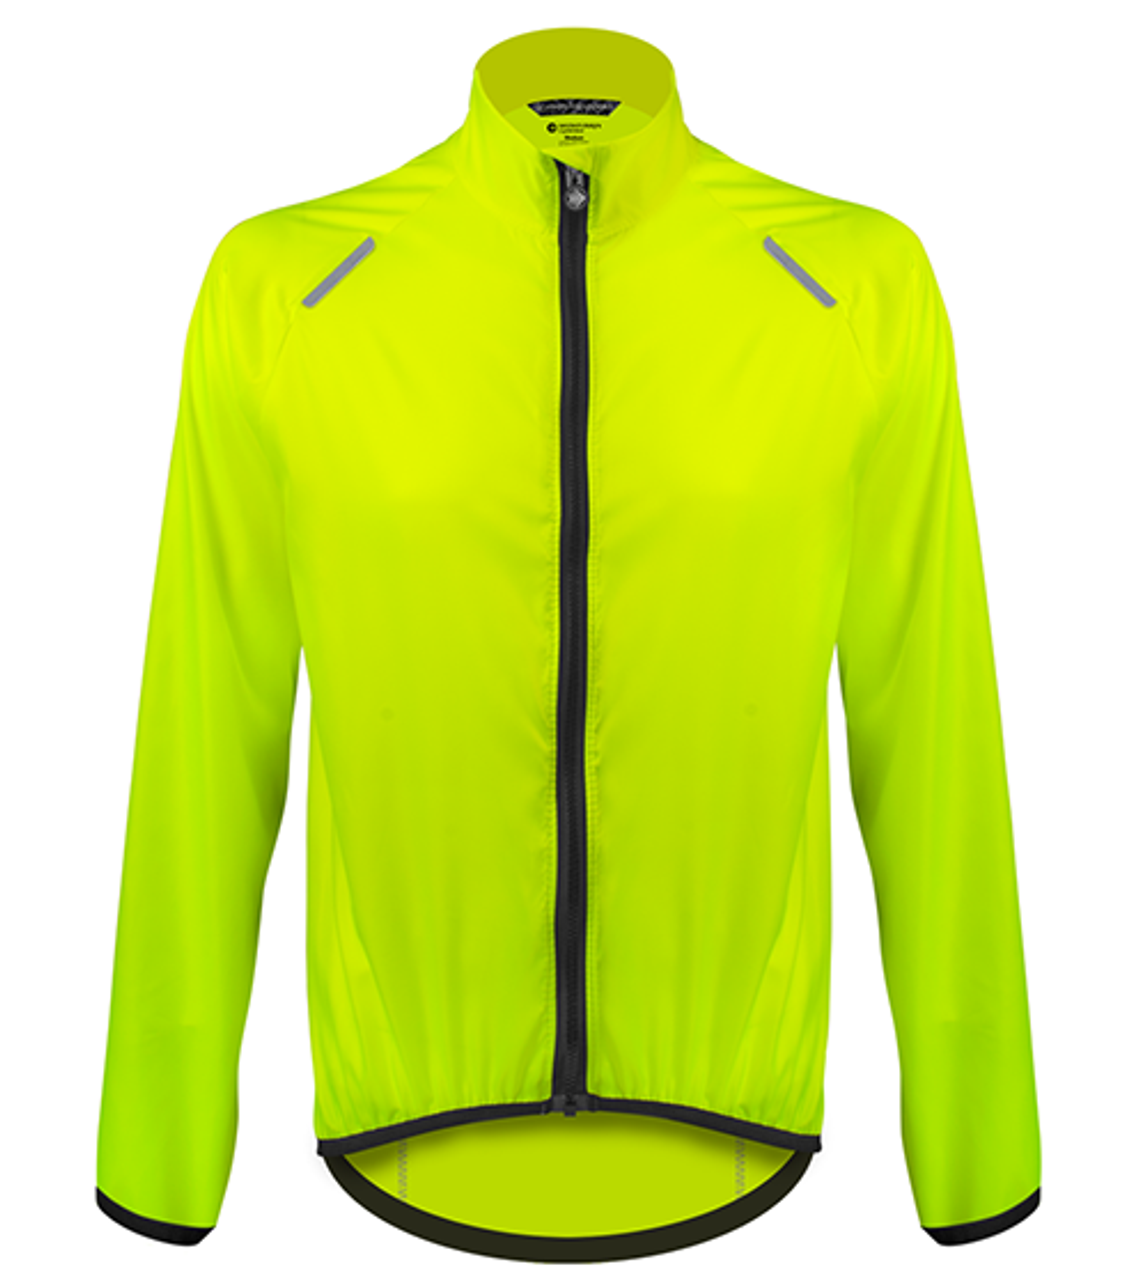 6db333860 Aero Tech TALL Windbreaker Jacket in Hi-Visibility Safety Yellow